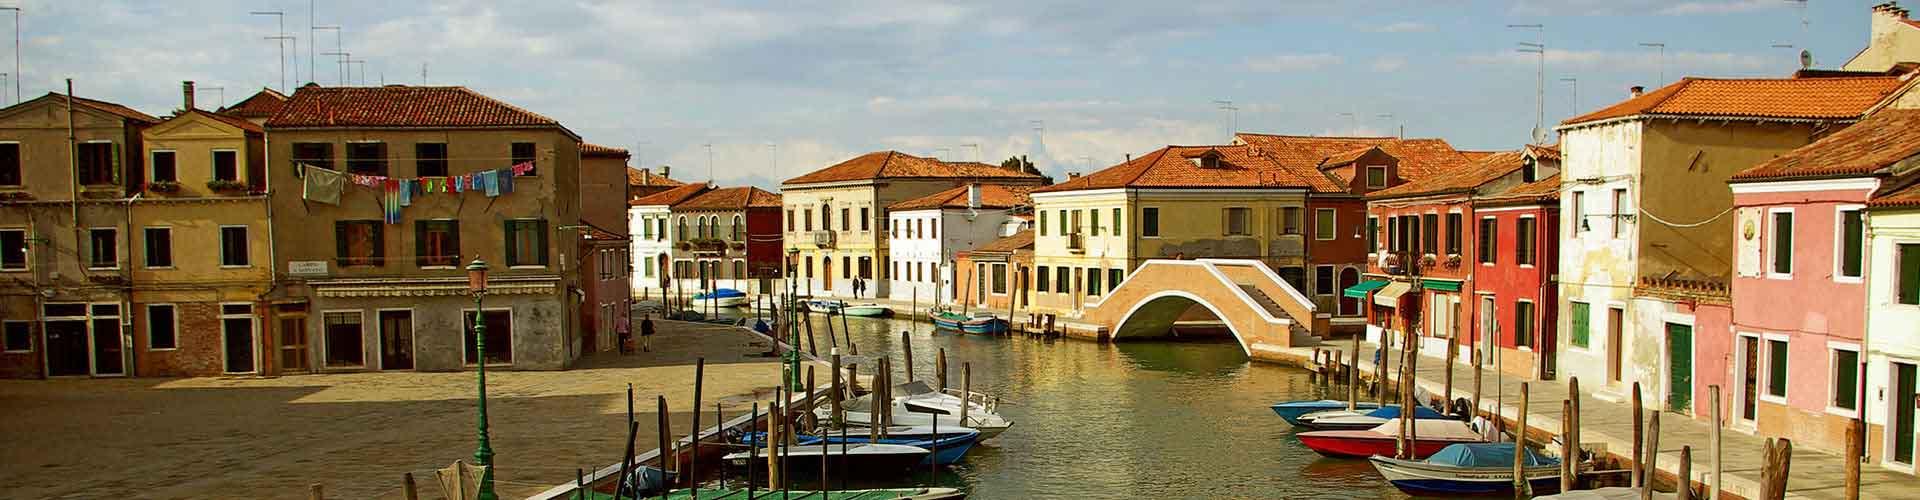 Venice Mestre – Hostellit kaupungiosassa Quartiere Mestre Centro. Venice Mestre -karttoja, valokuvia ja arvosteluja kaikista Venice Mestre -hostelleista.